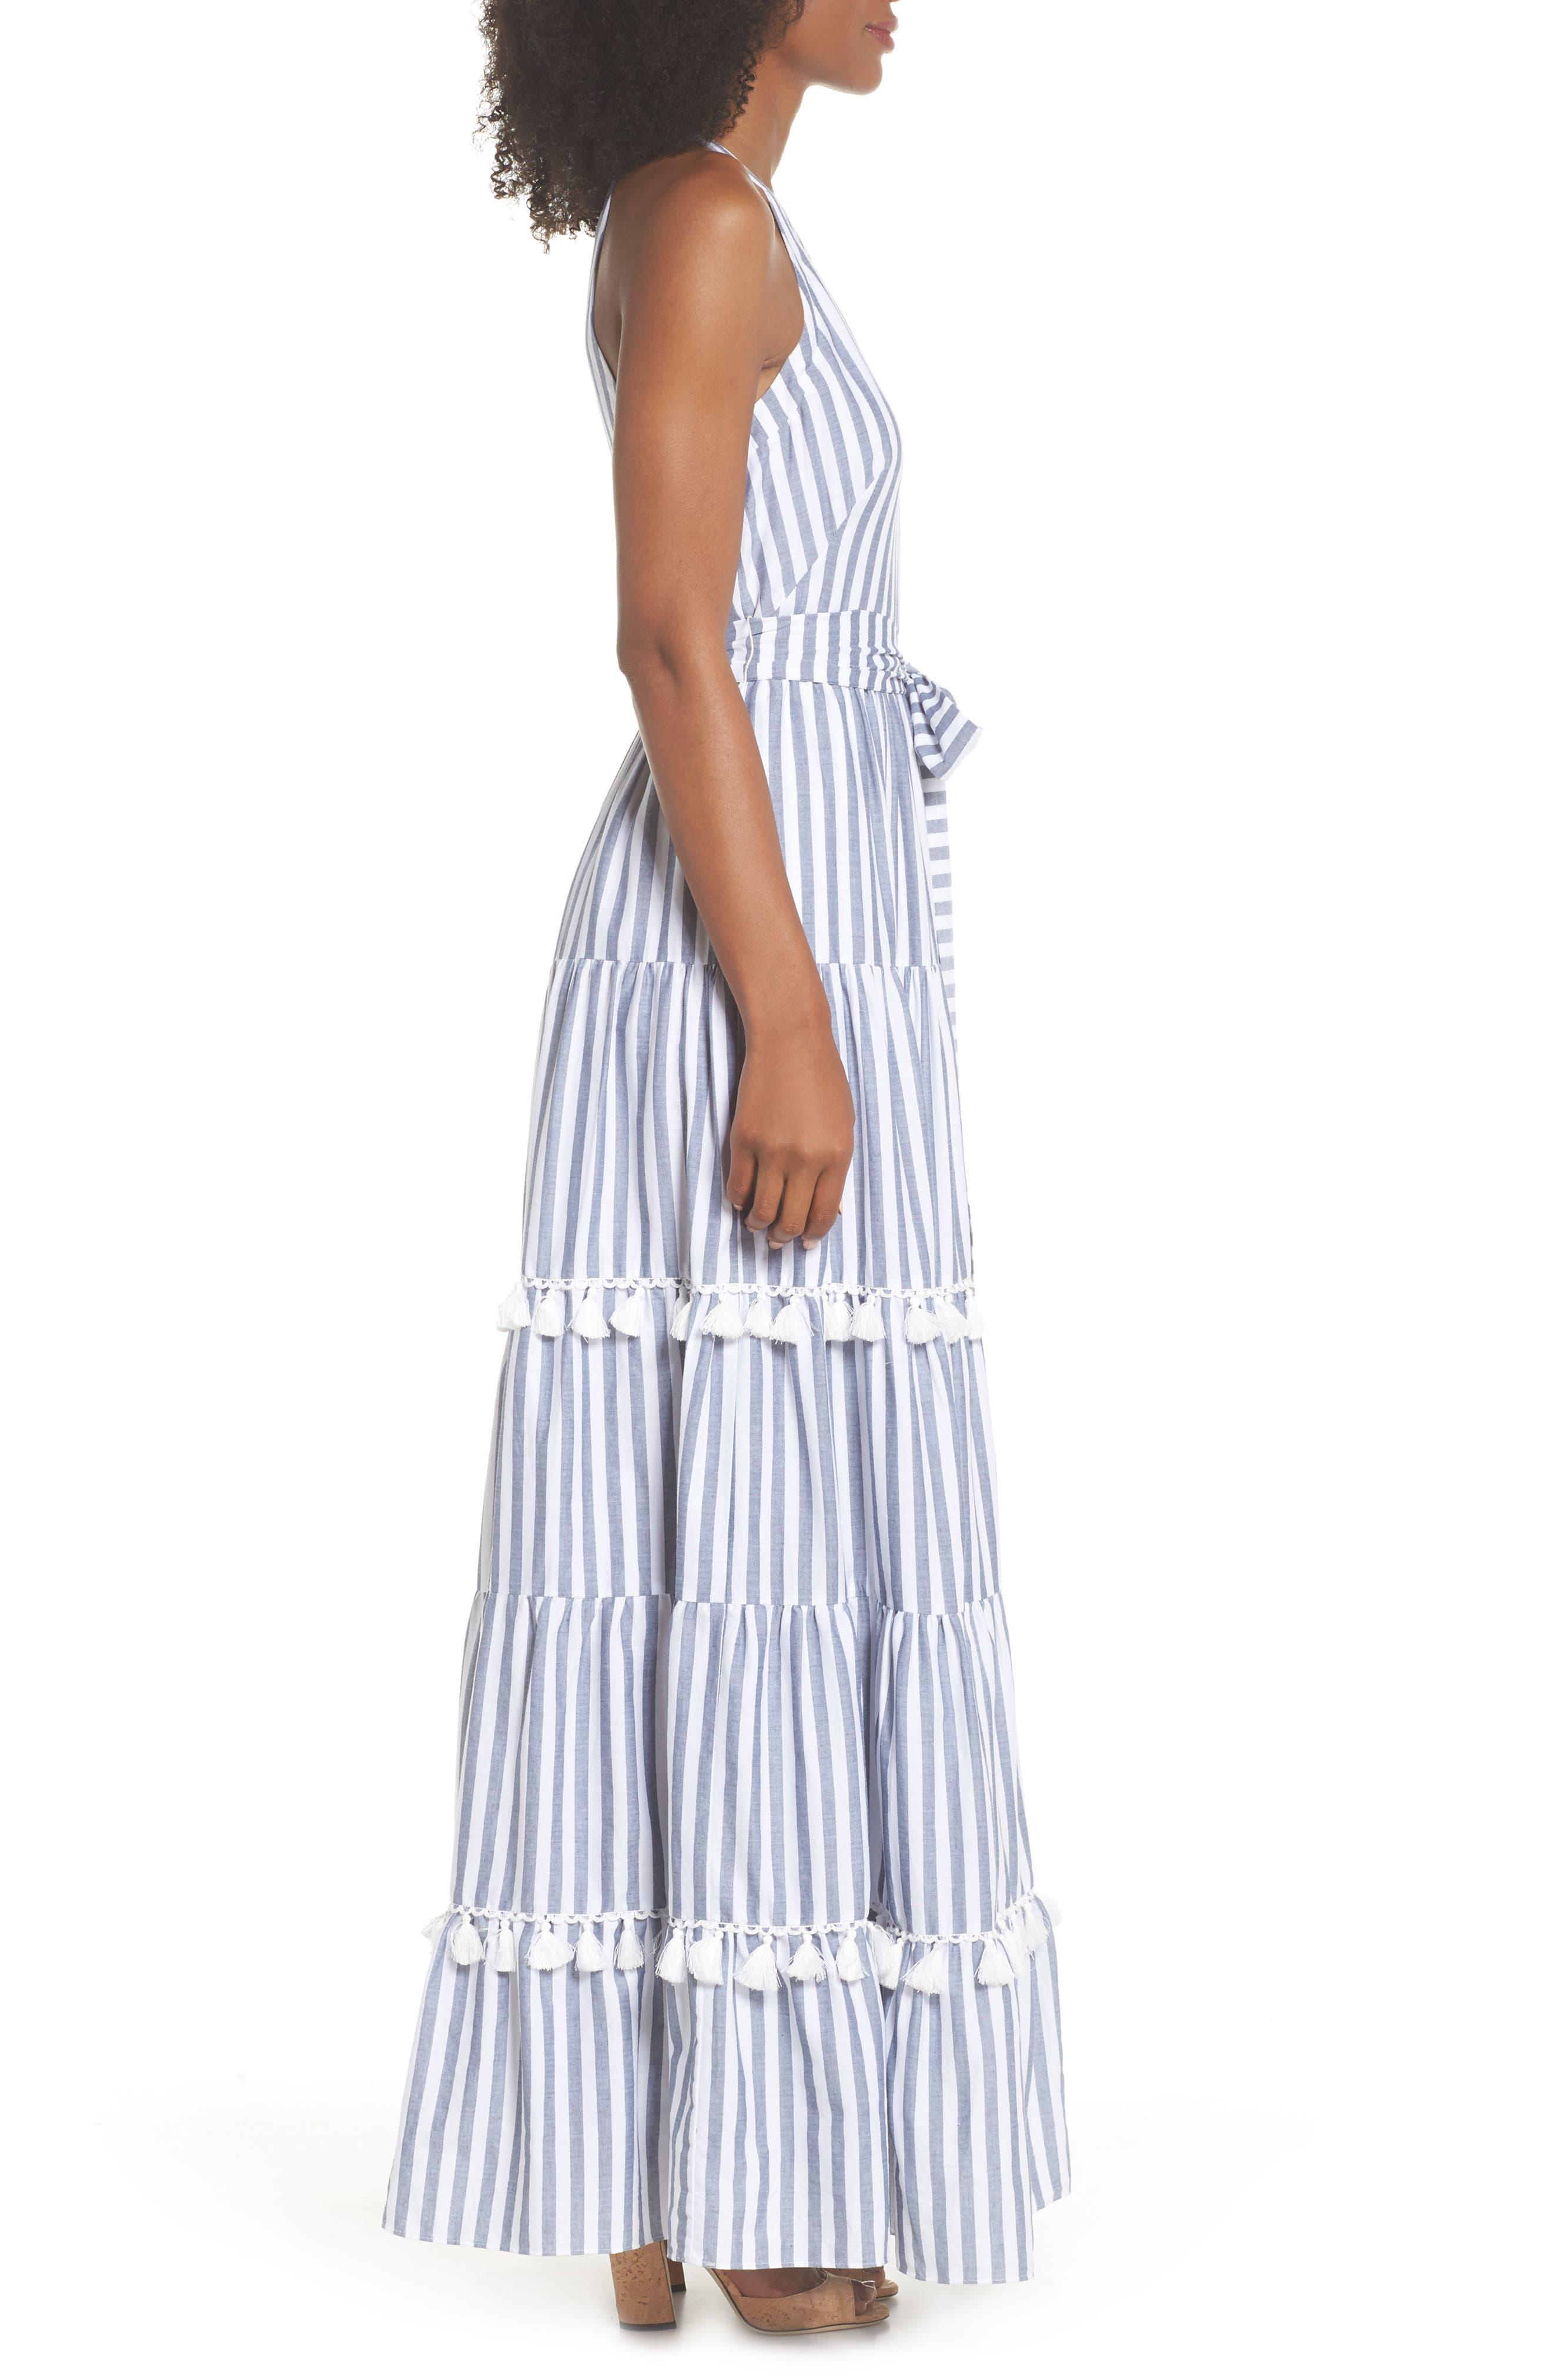 ELIZA J,                             Tiered Tassel Fringe Cotton Maxi Dress,                             Alternate thumbnail 3, color,                             IVORY/ GREY